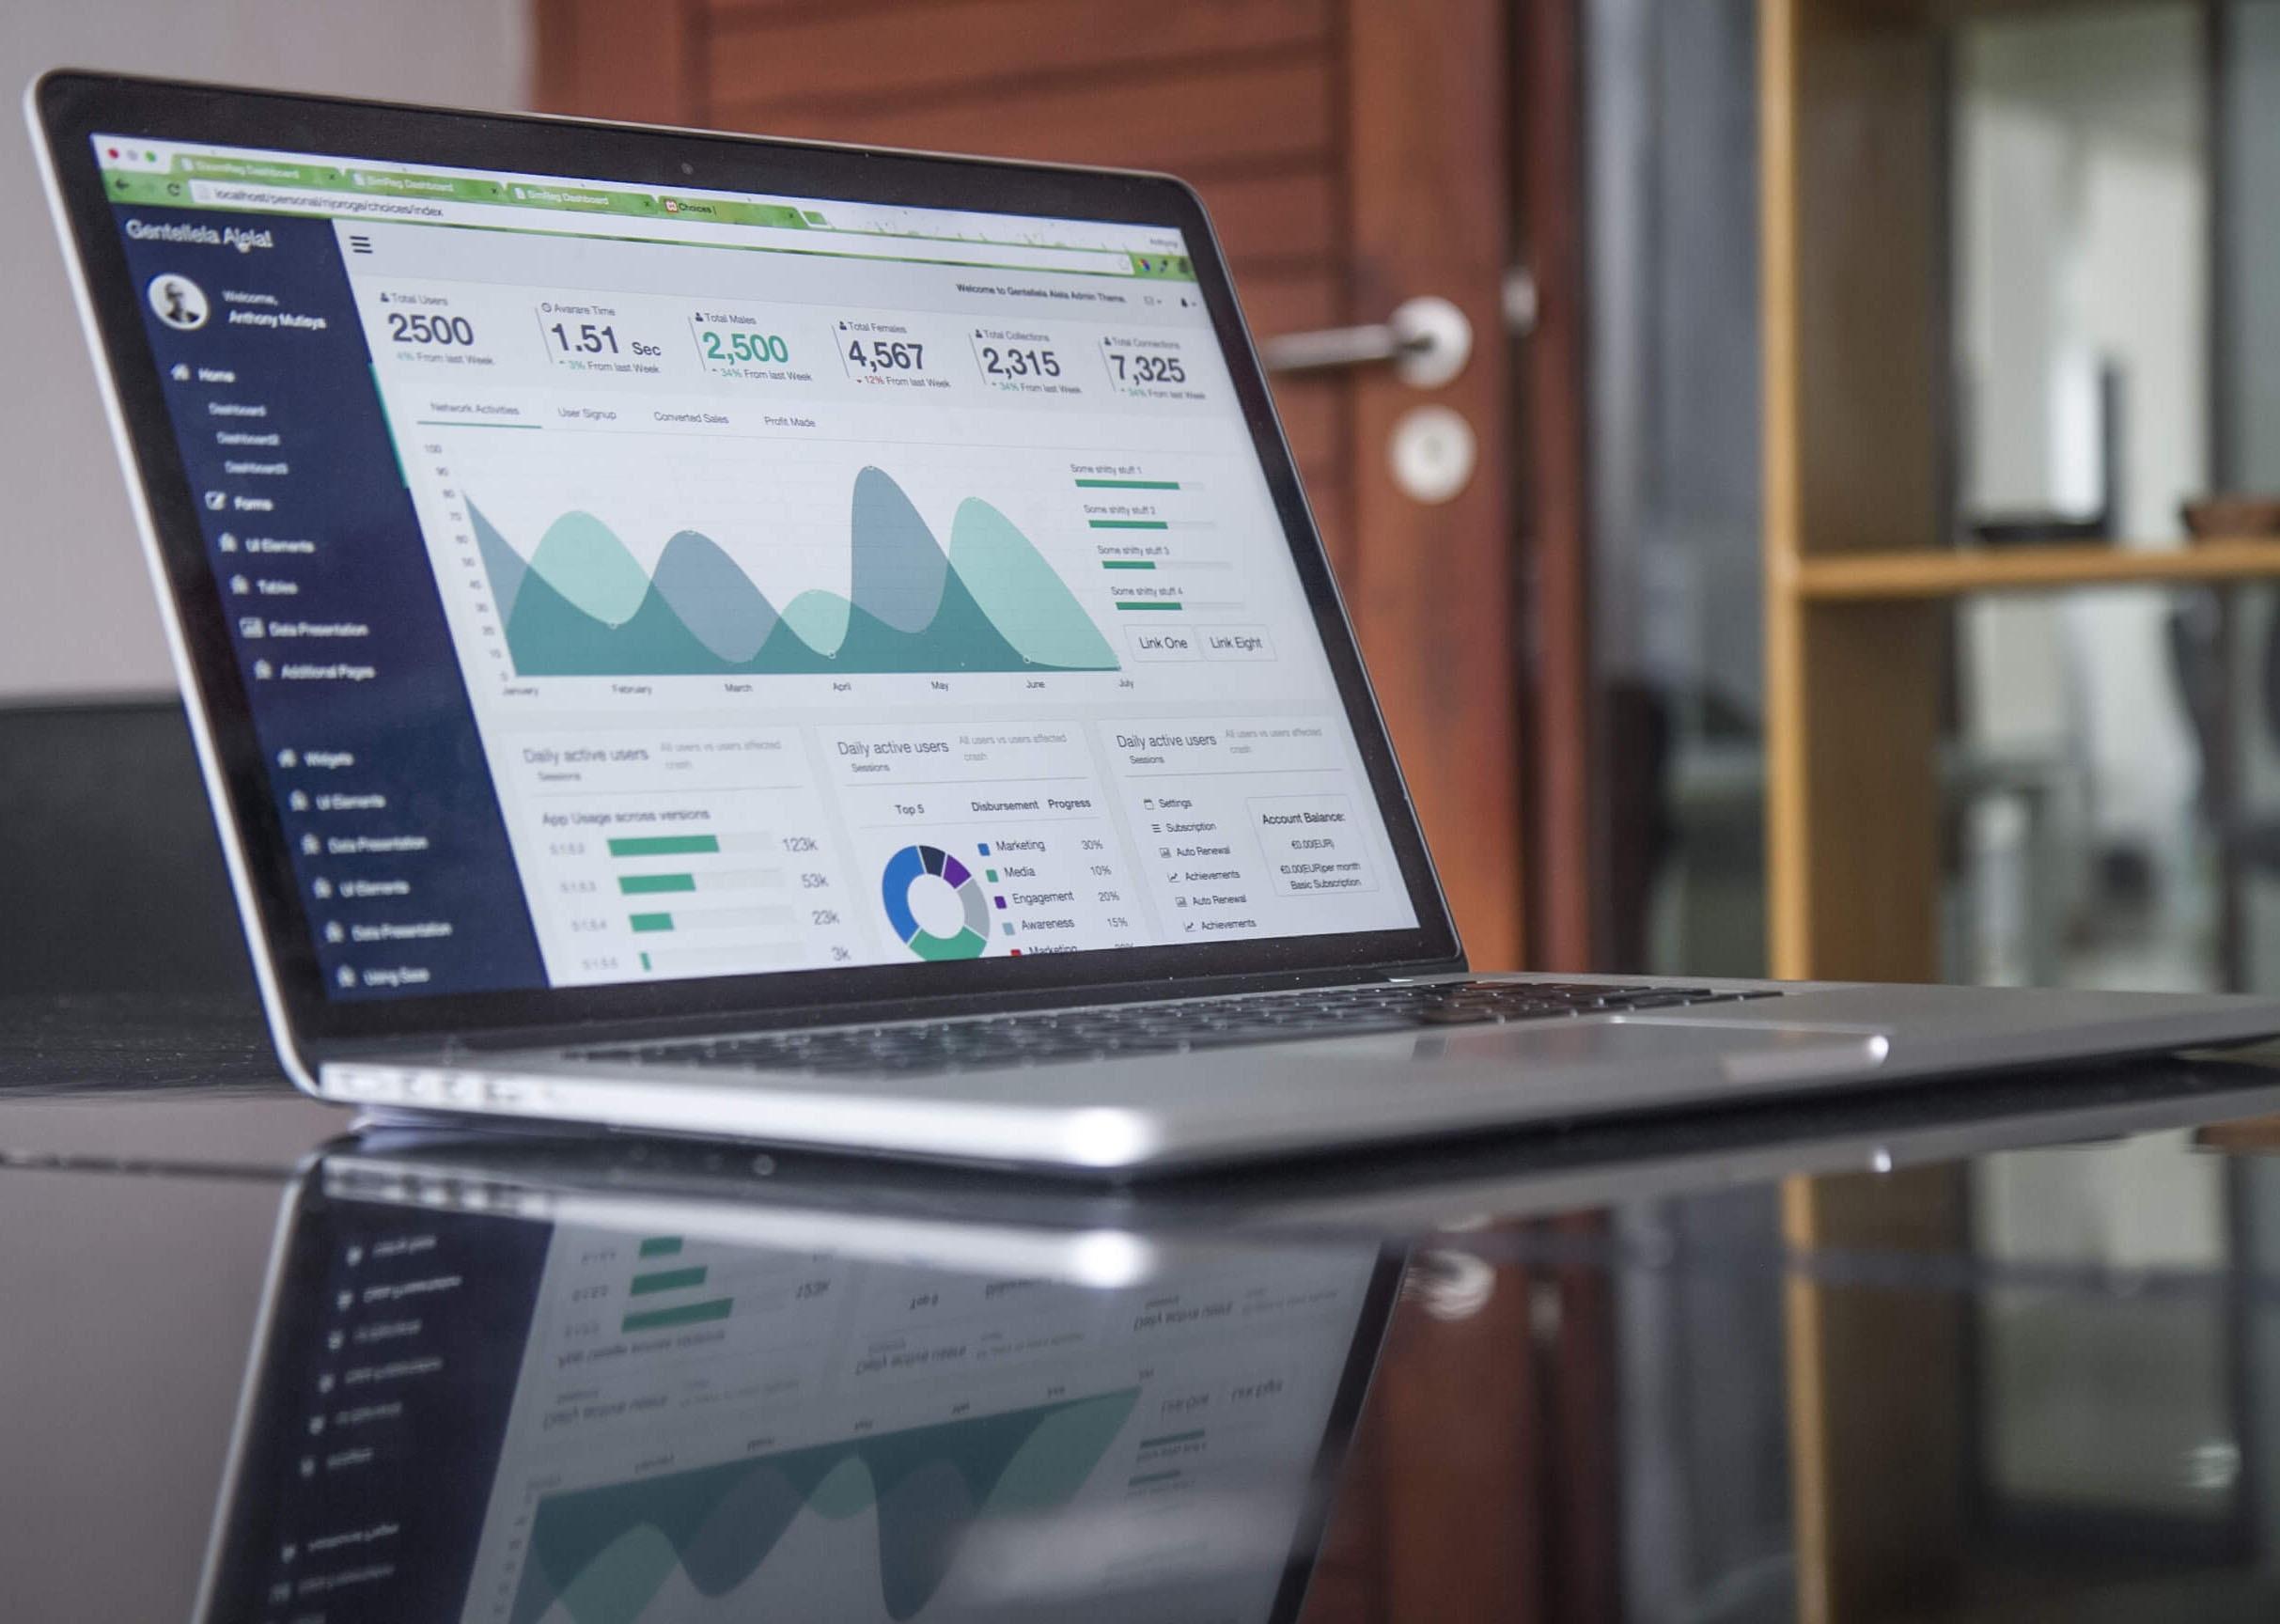 2018.HST.953: Collaborative Data Science in Medicine